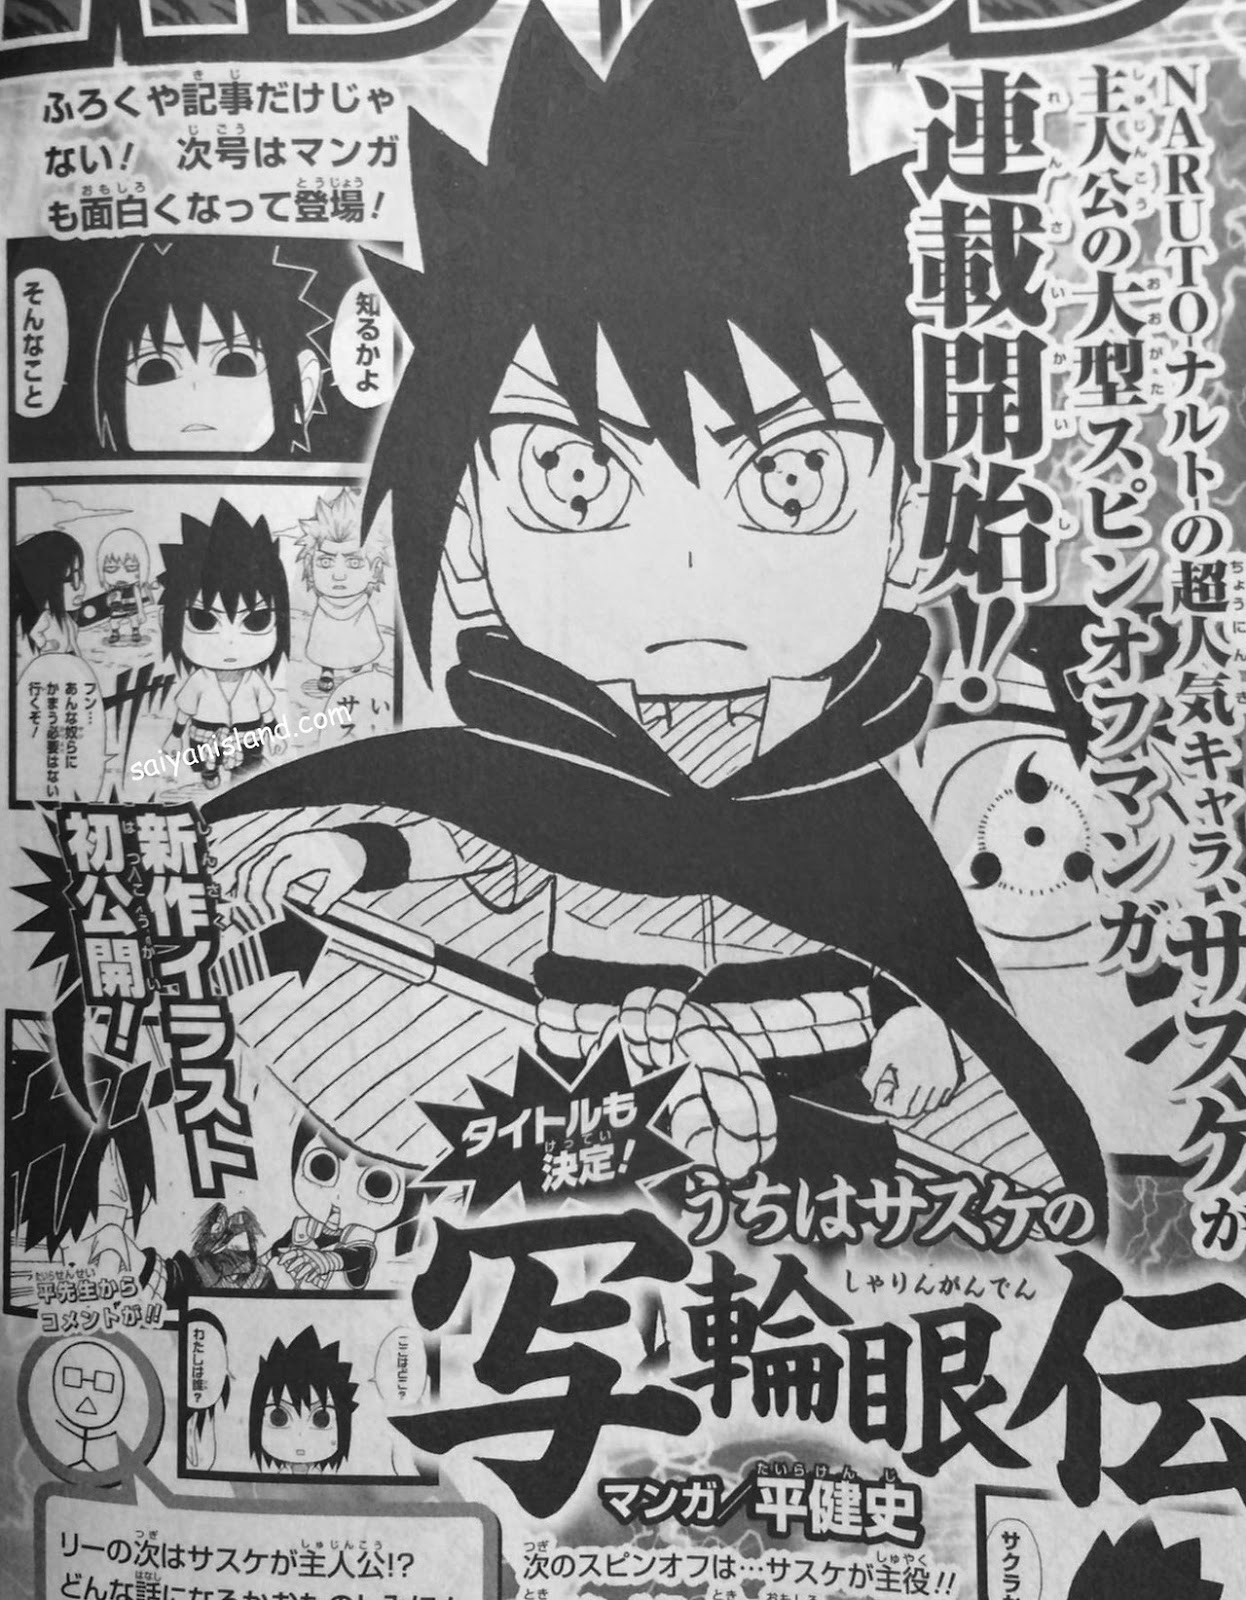 Actu Manga, Kenji Taira, Manga, Saikyô Jump, Uchiha Sasuke no Shuringan Den,